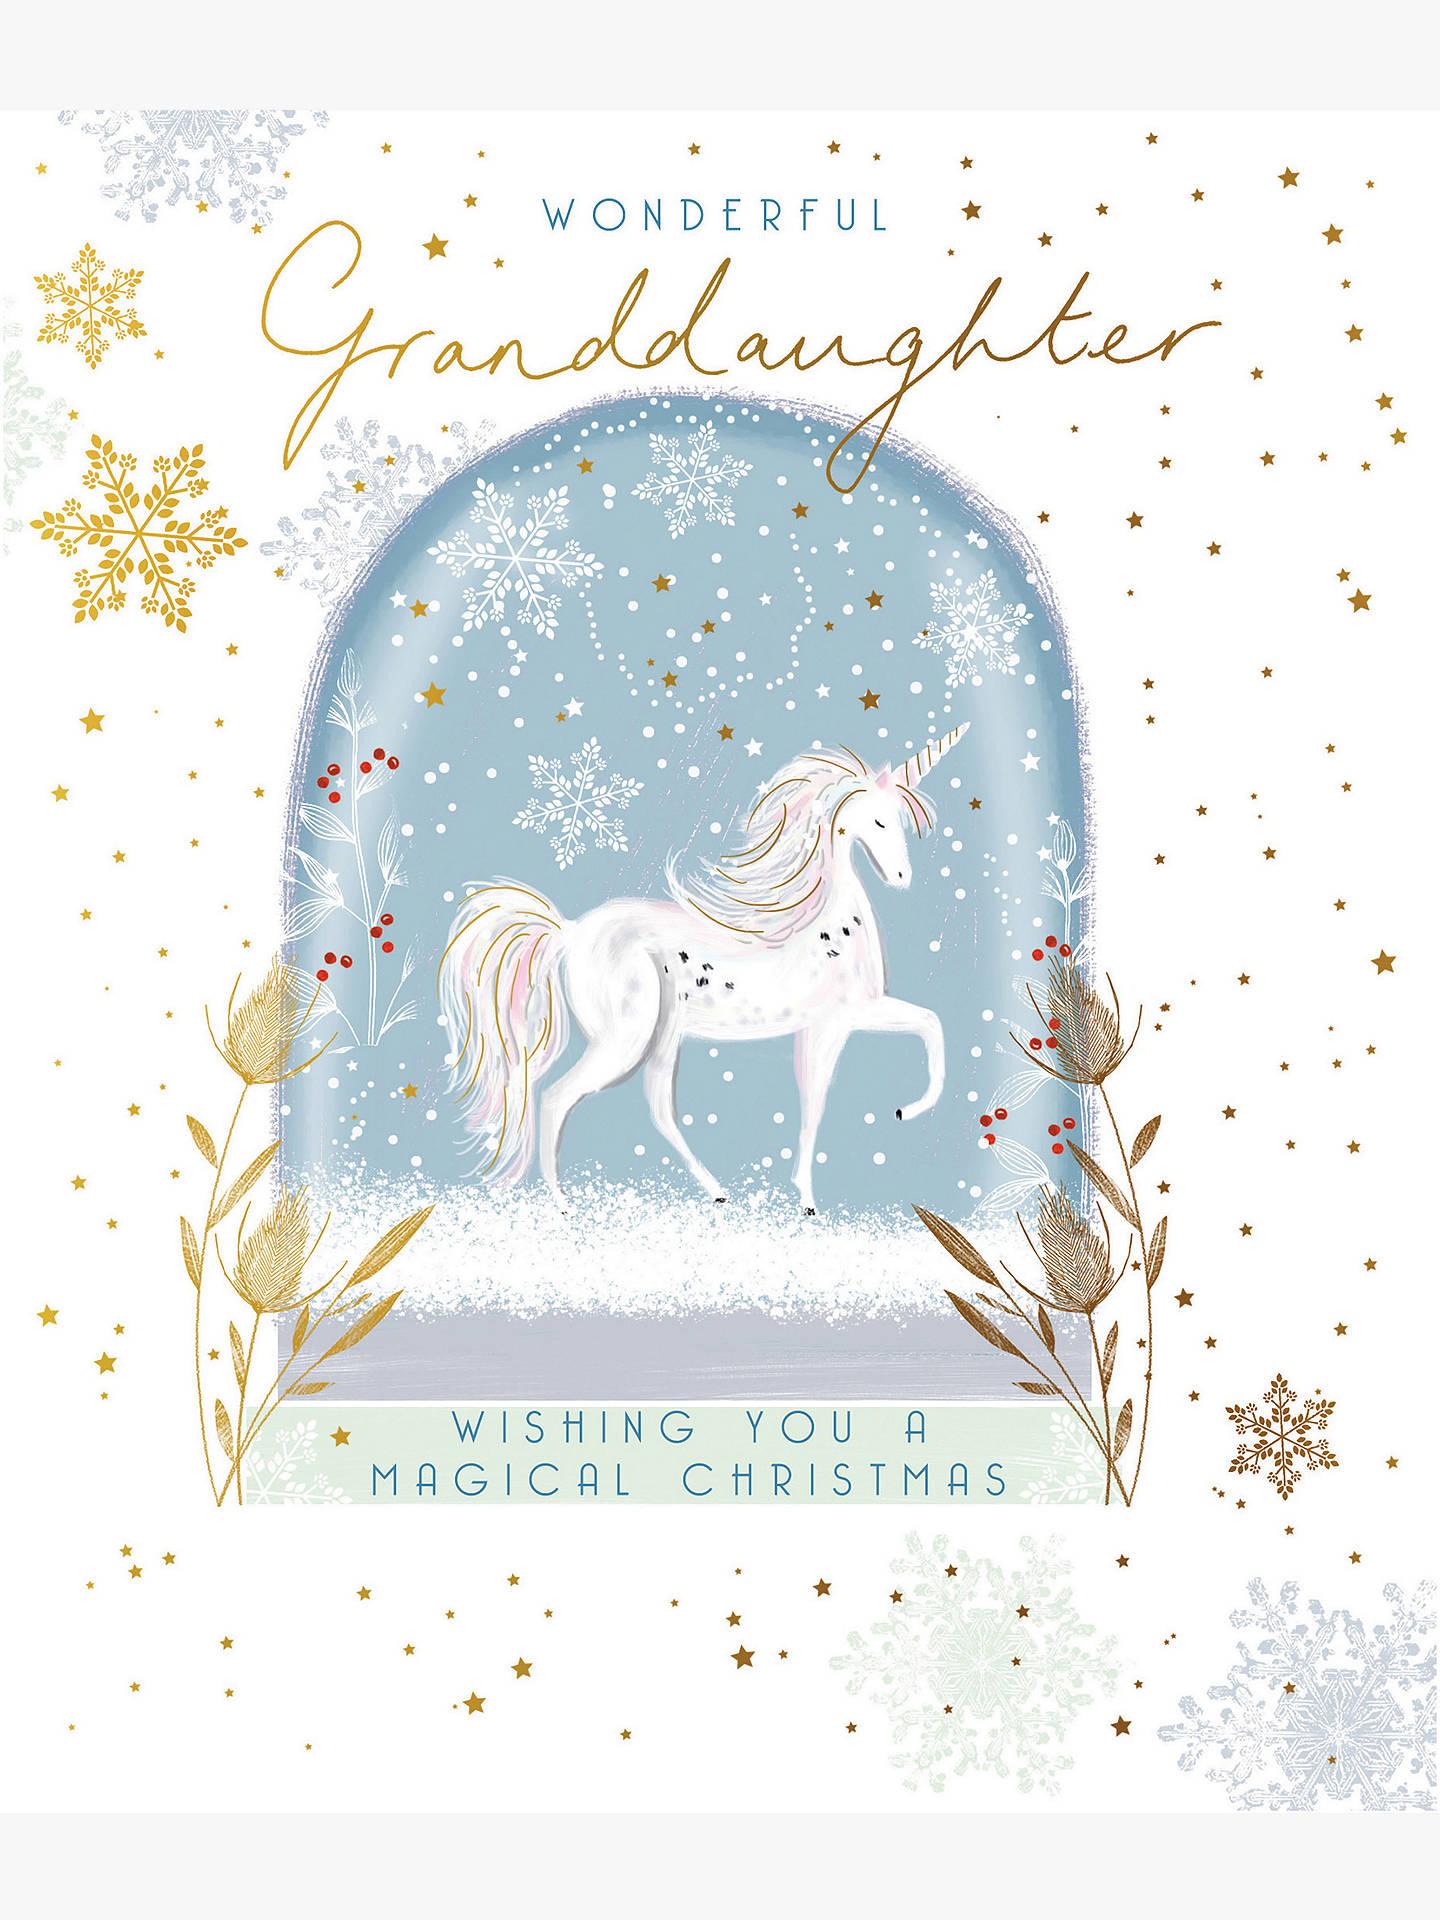 woodmansterne unicorn wonderful granddaughter christmas